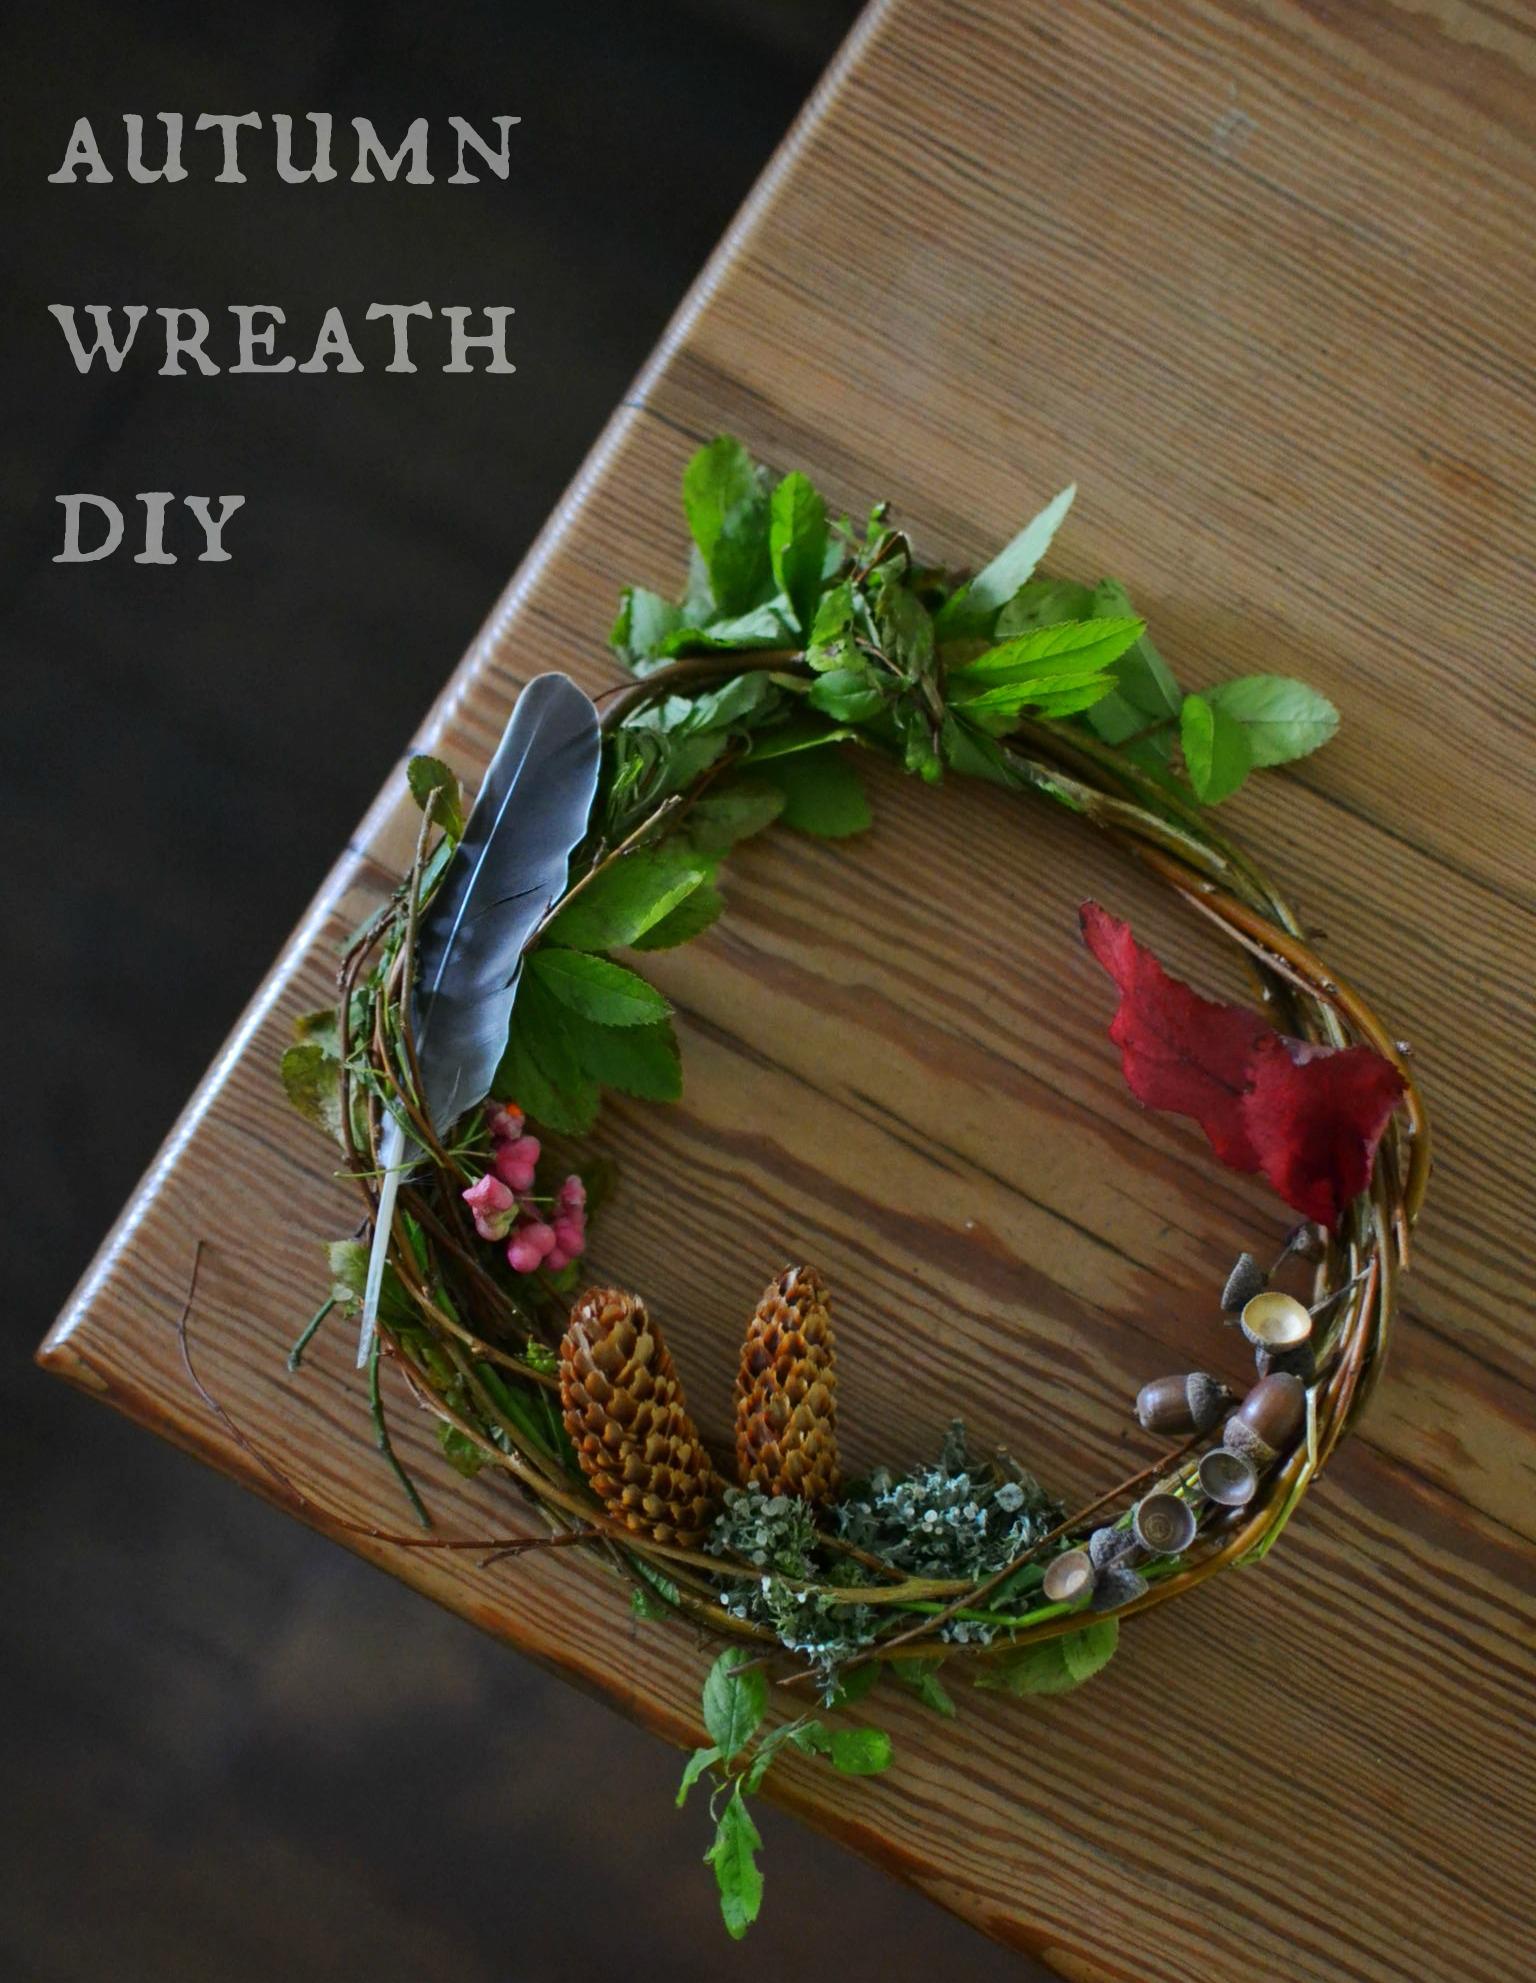 15-minute make: autumn wreath DIY - Decorator's Notebook